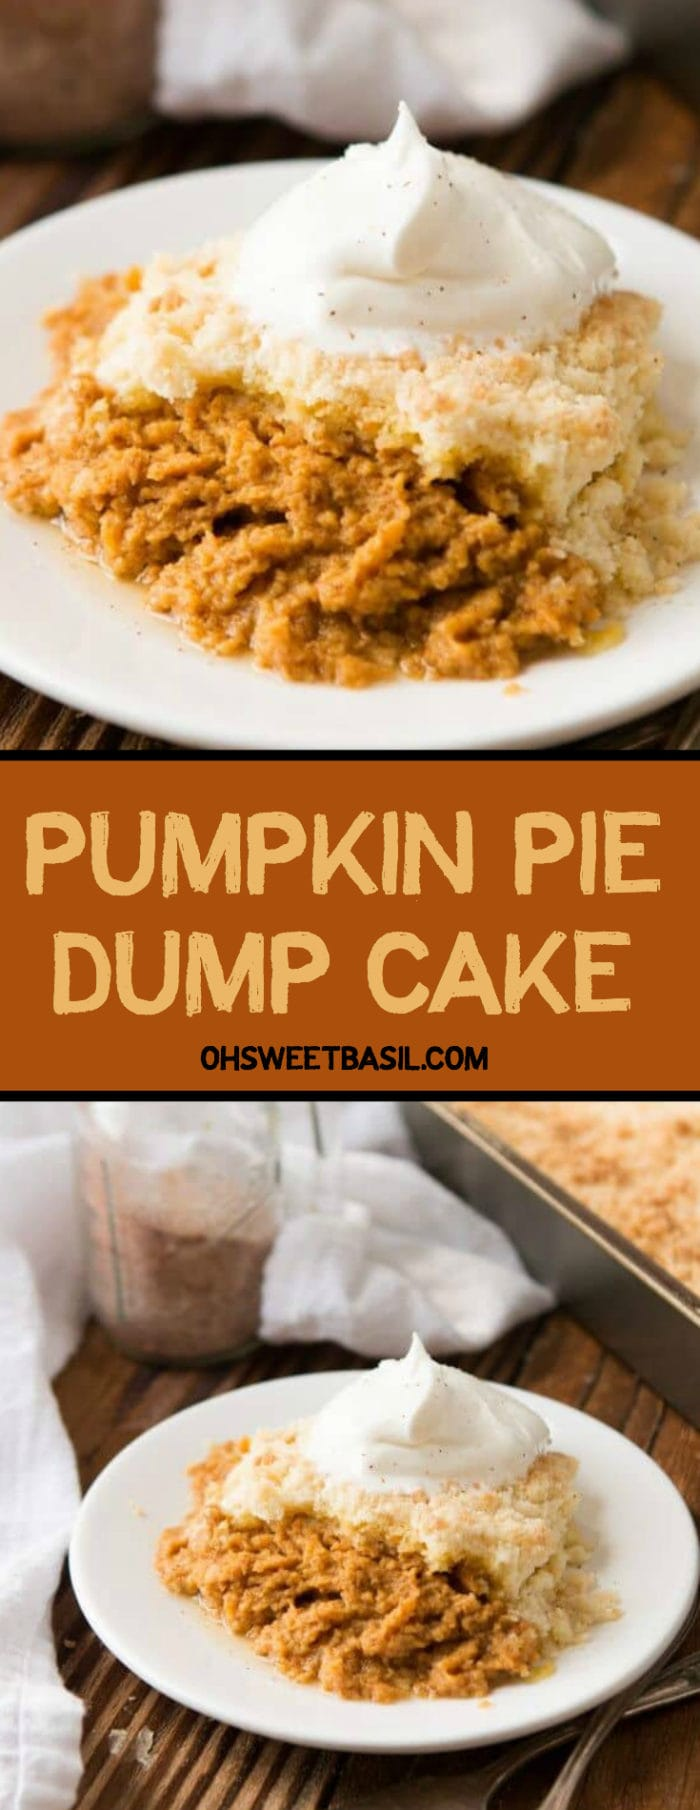 Mom's Pumpkin Pie Dump Cake with fresh whip cream on top